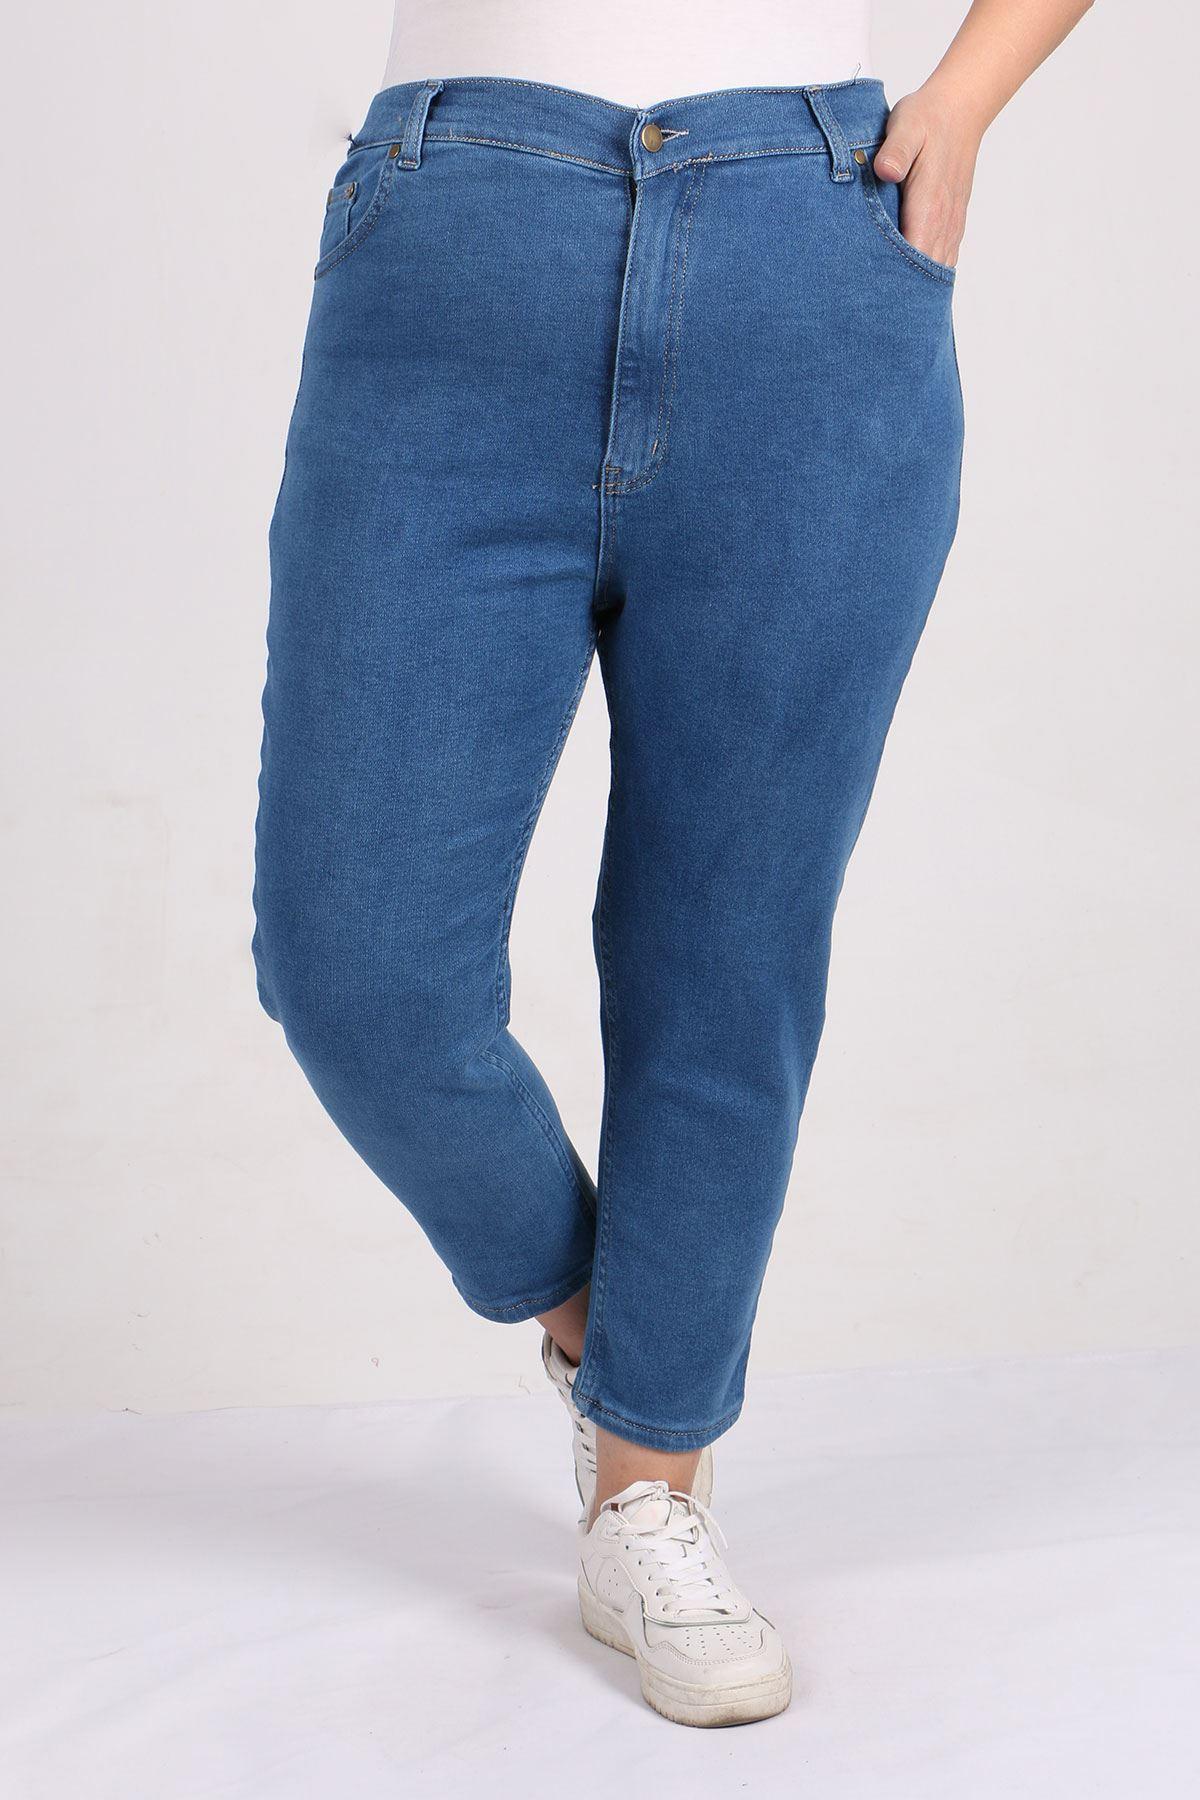 9125 Büyük Beden Boyfriend Kot Pantolon - Açık Mavi